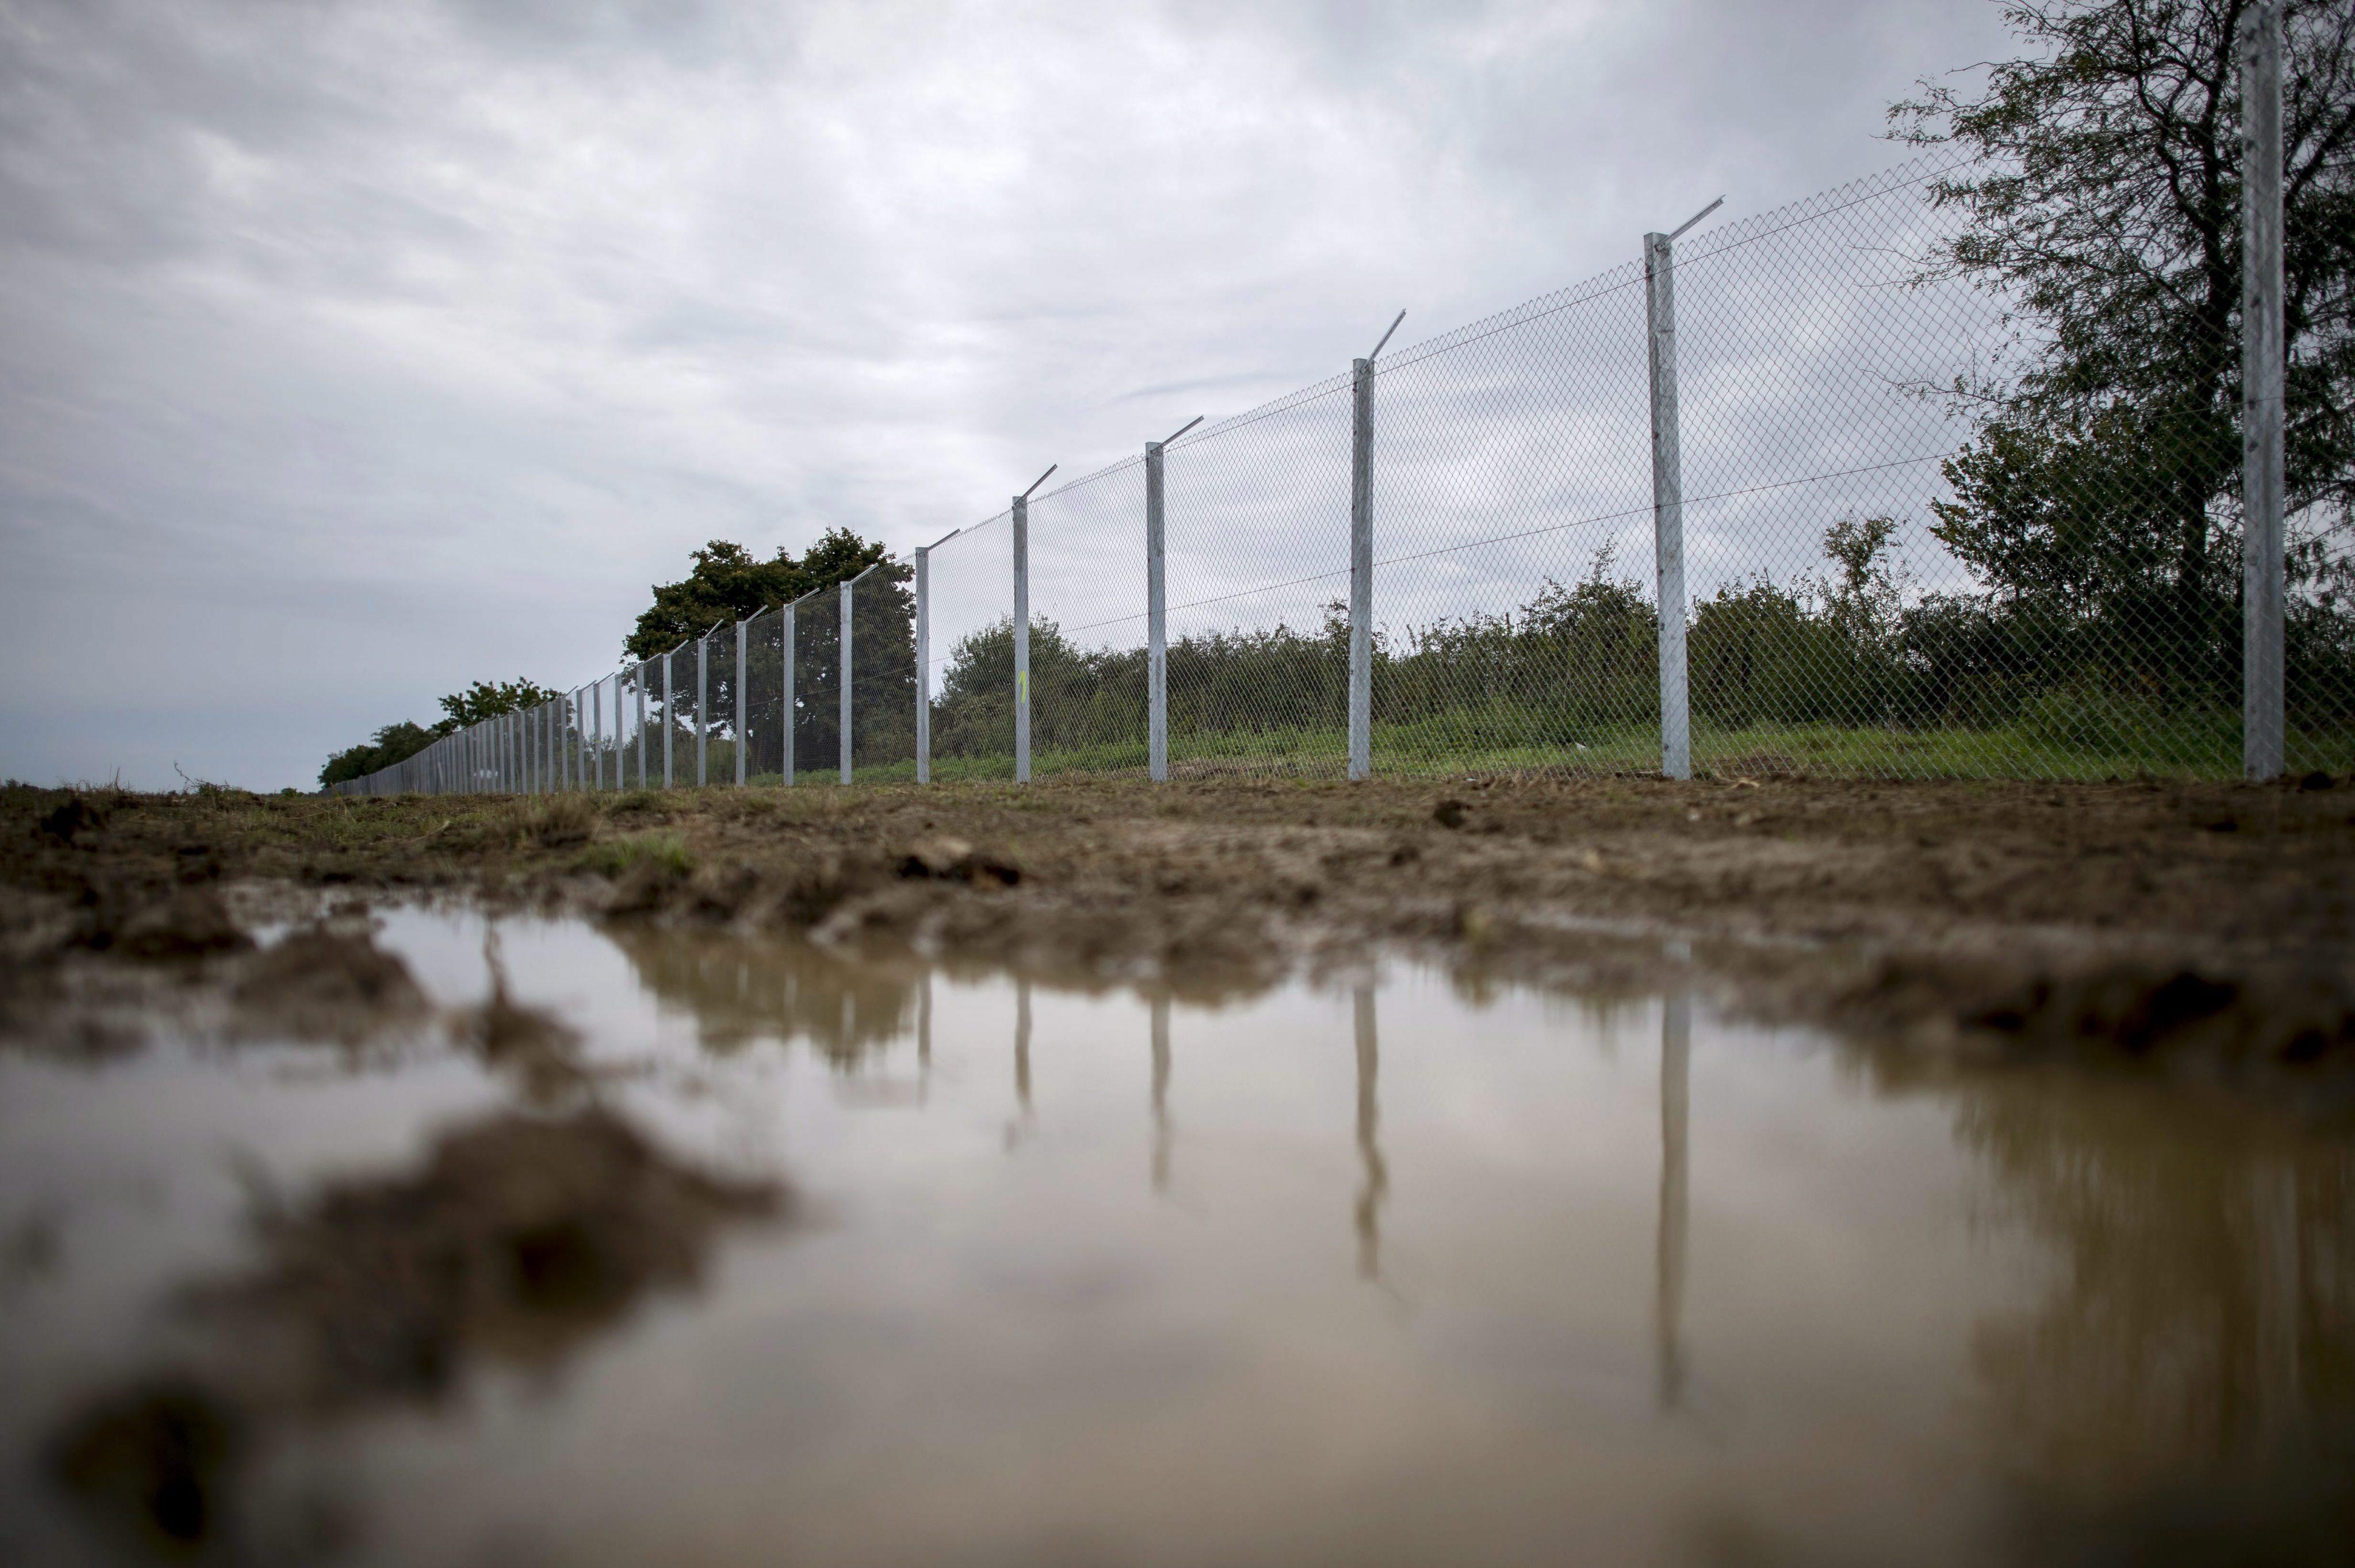 EPA/TAMAS SOKI HUNGARY OUT